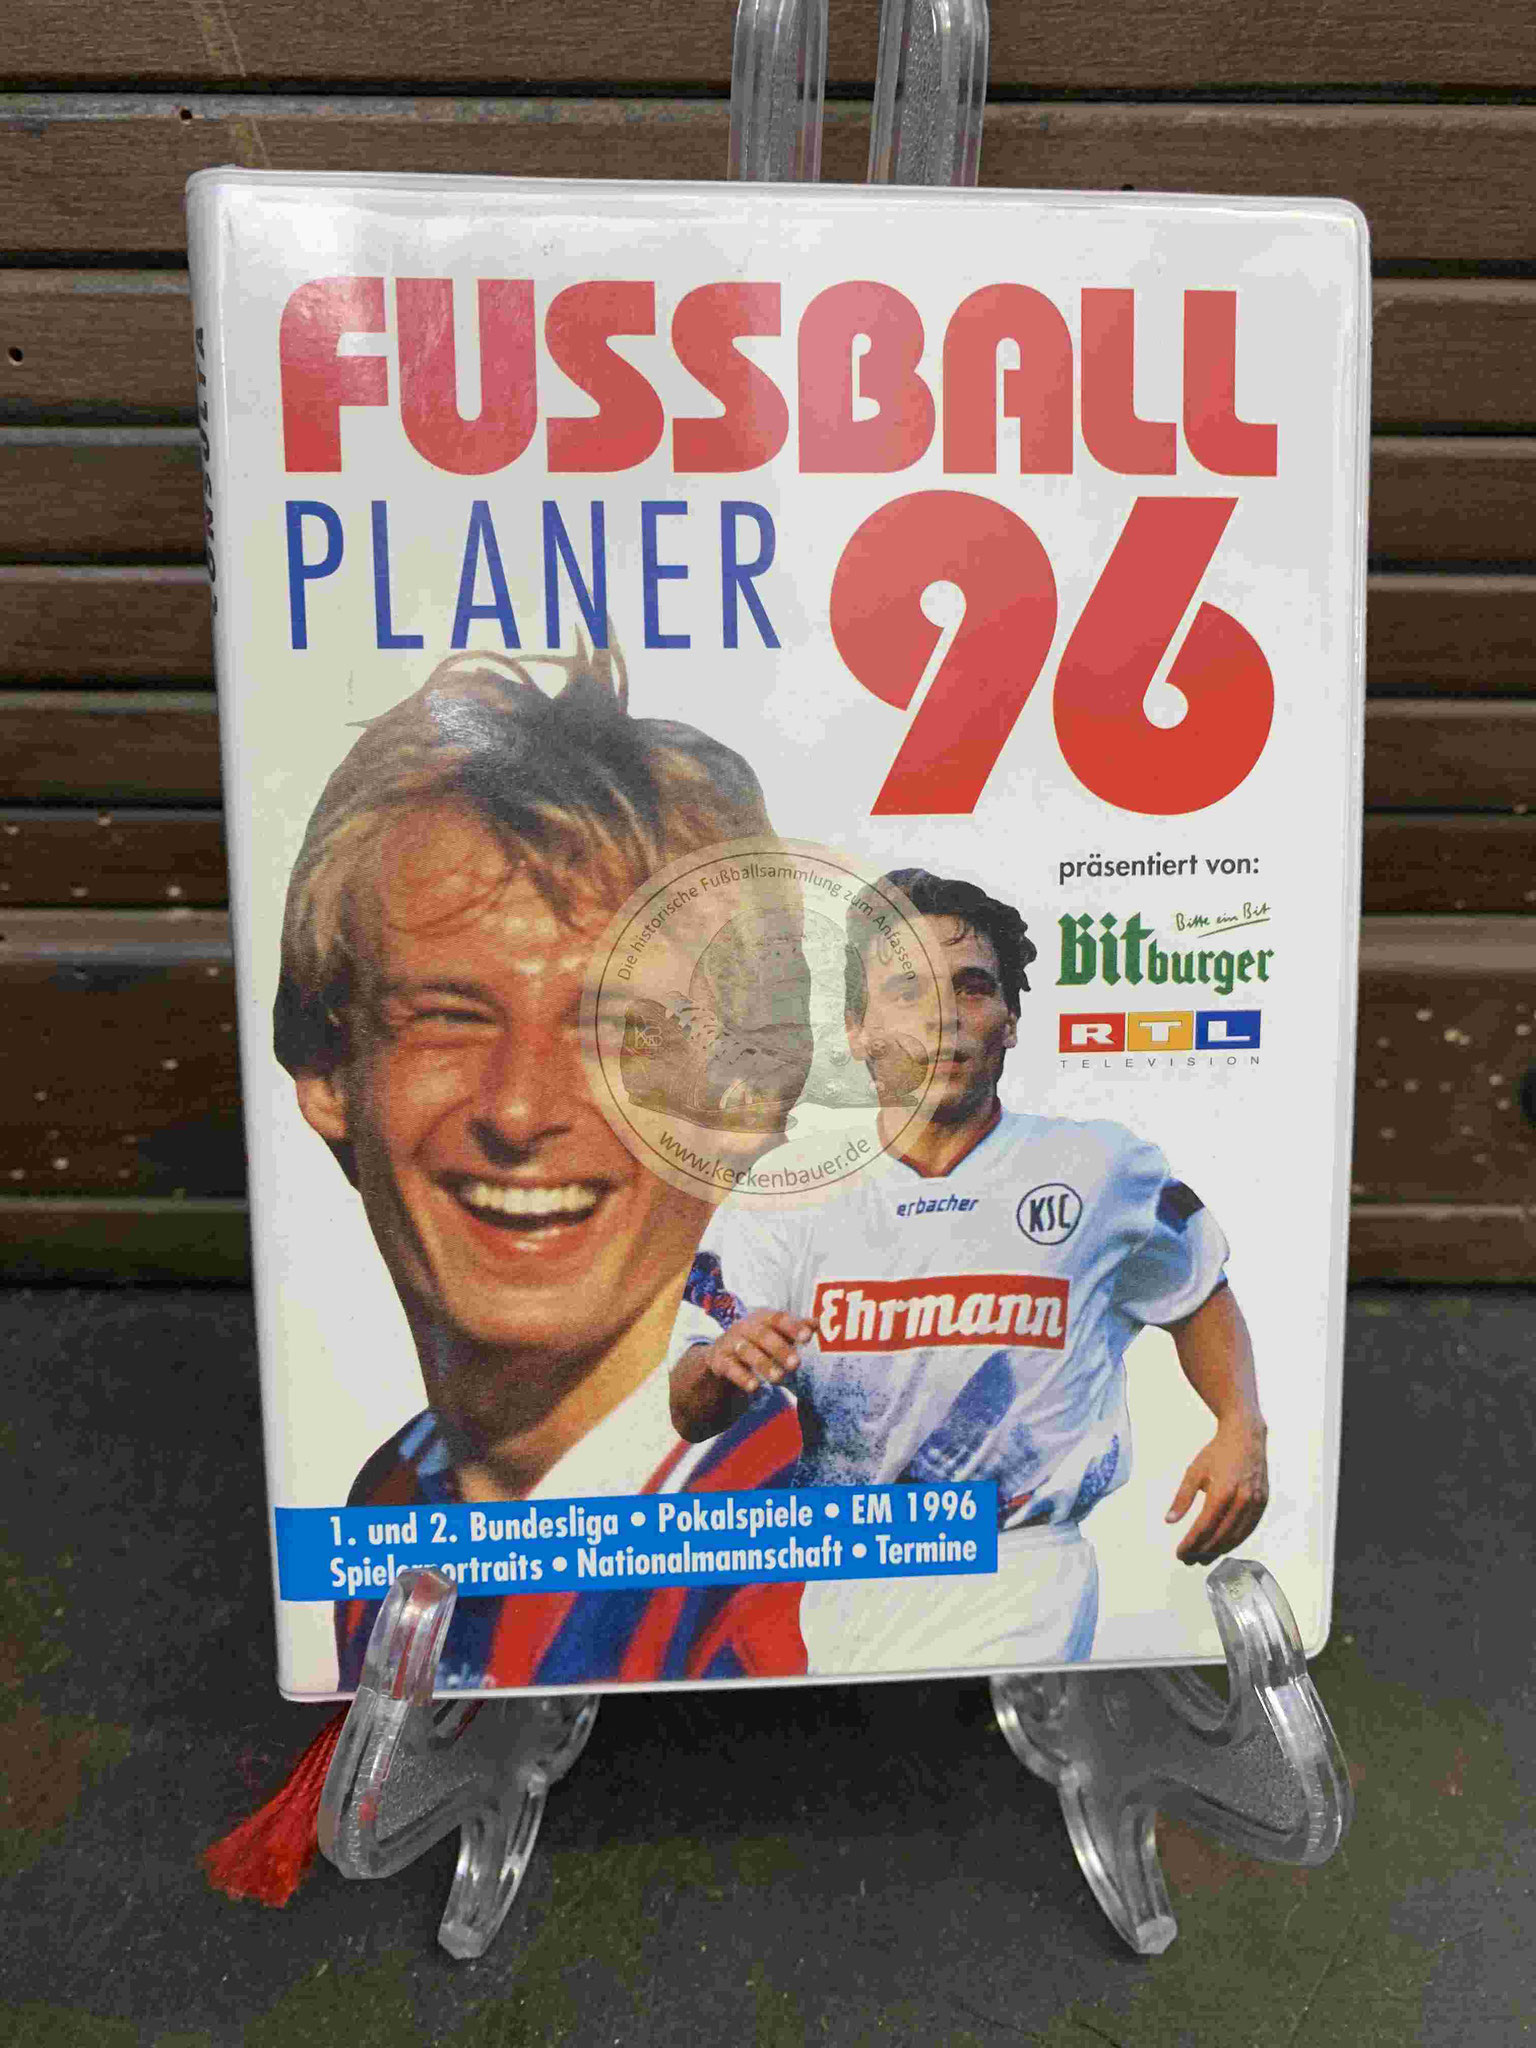 Fußball Planer 96